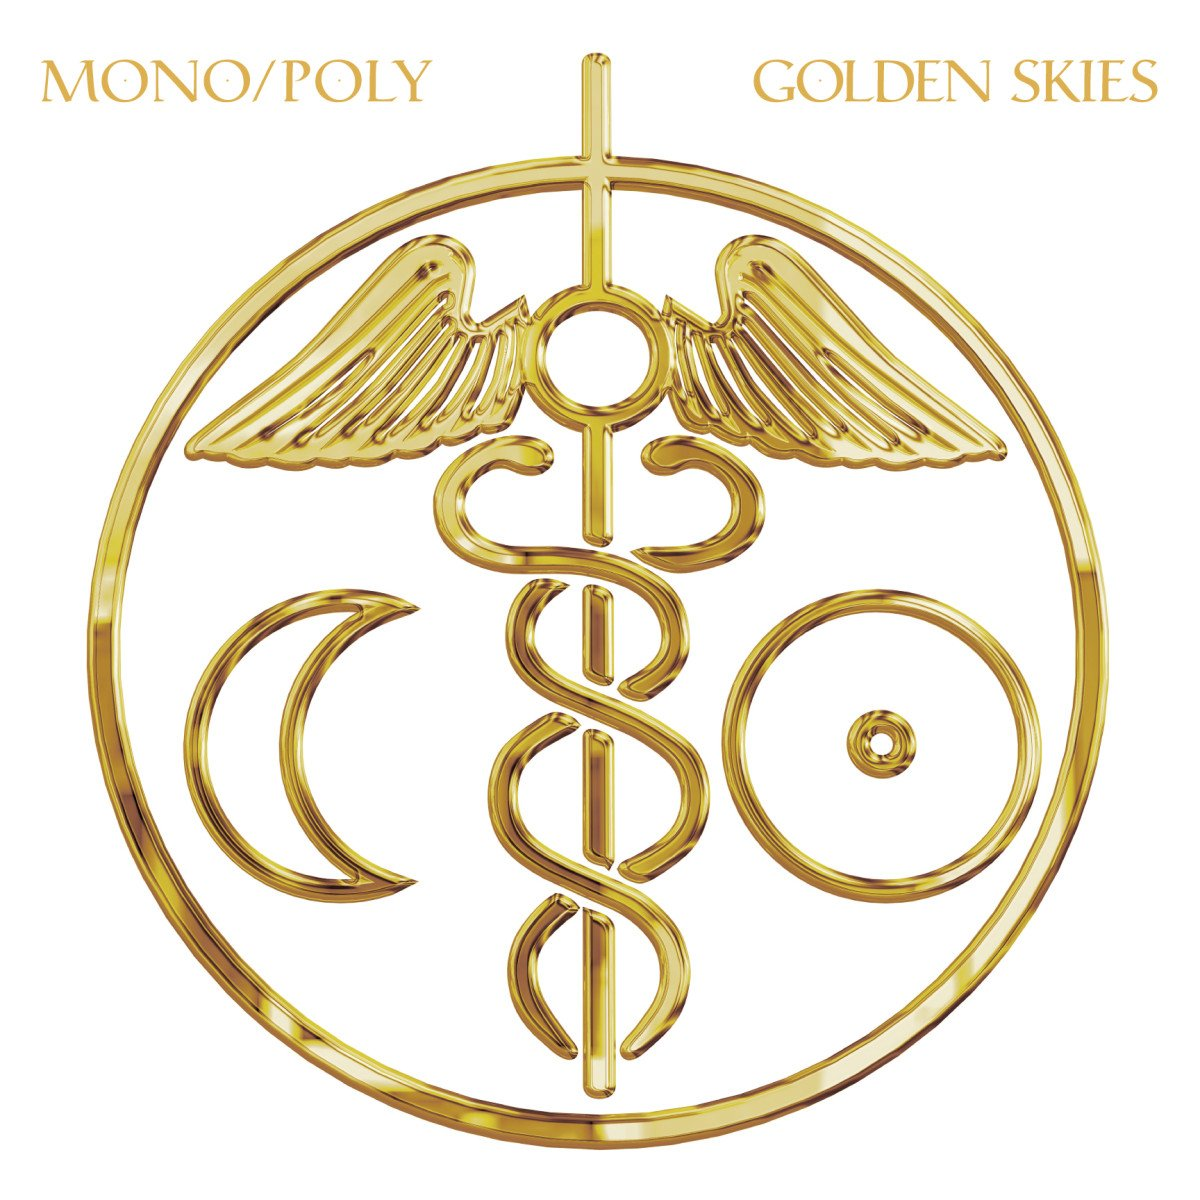 CD : Mono/Poly - Golden Skies (Digipack Packaging)